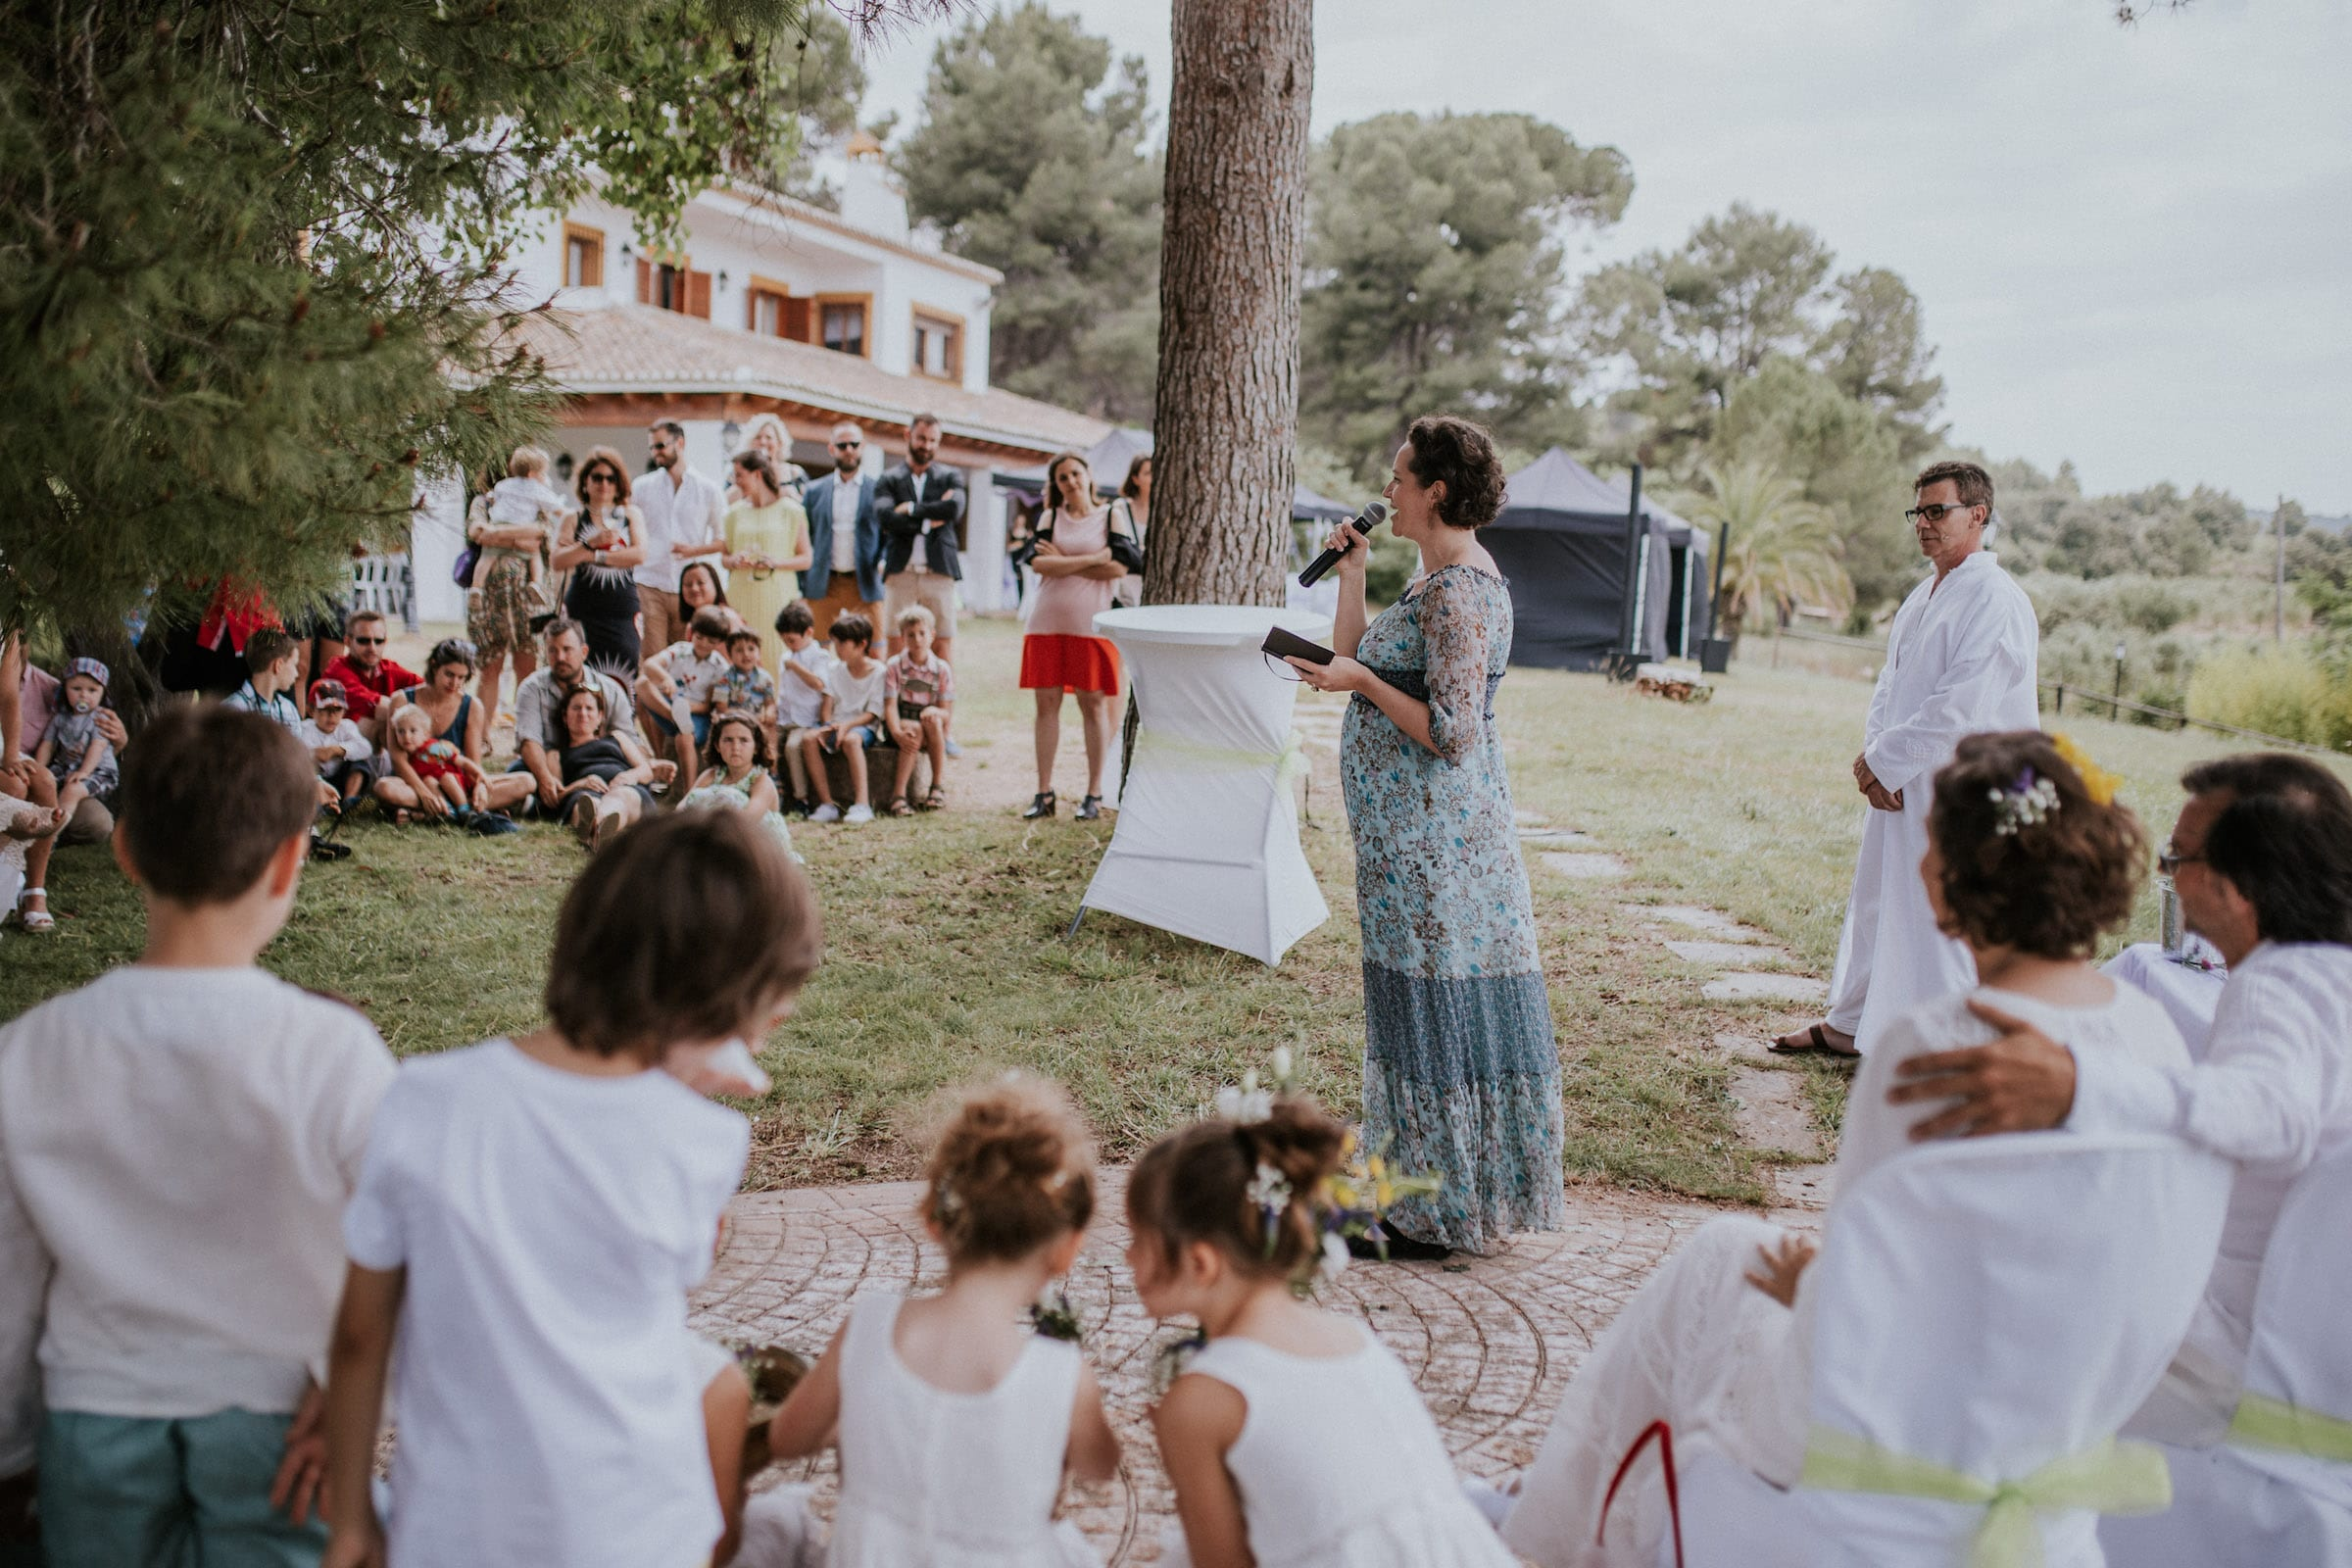 087+wedding+in+valencia+weddingphotographer.jpg